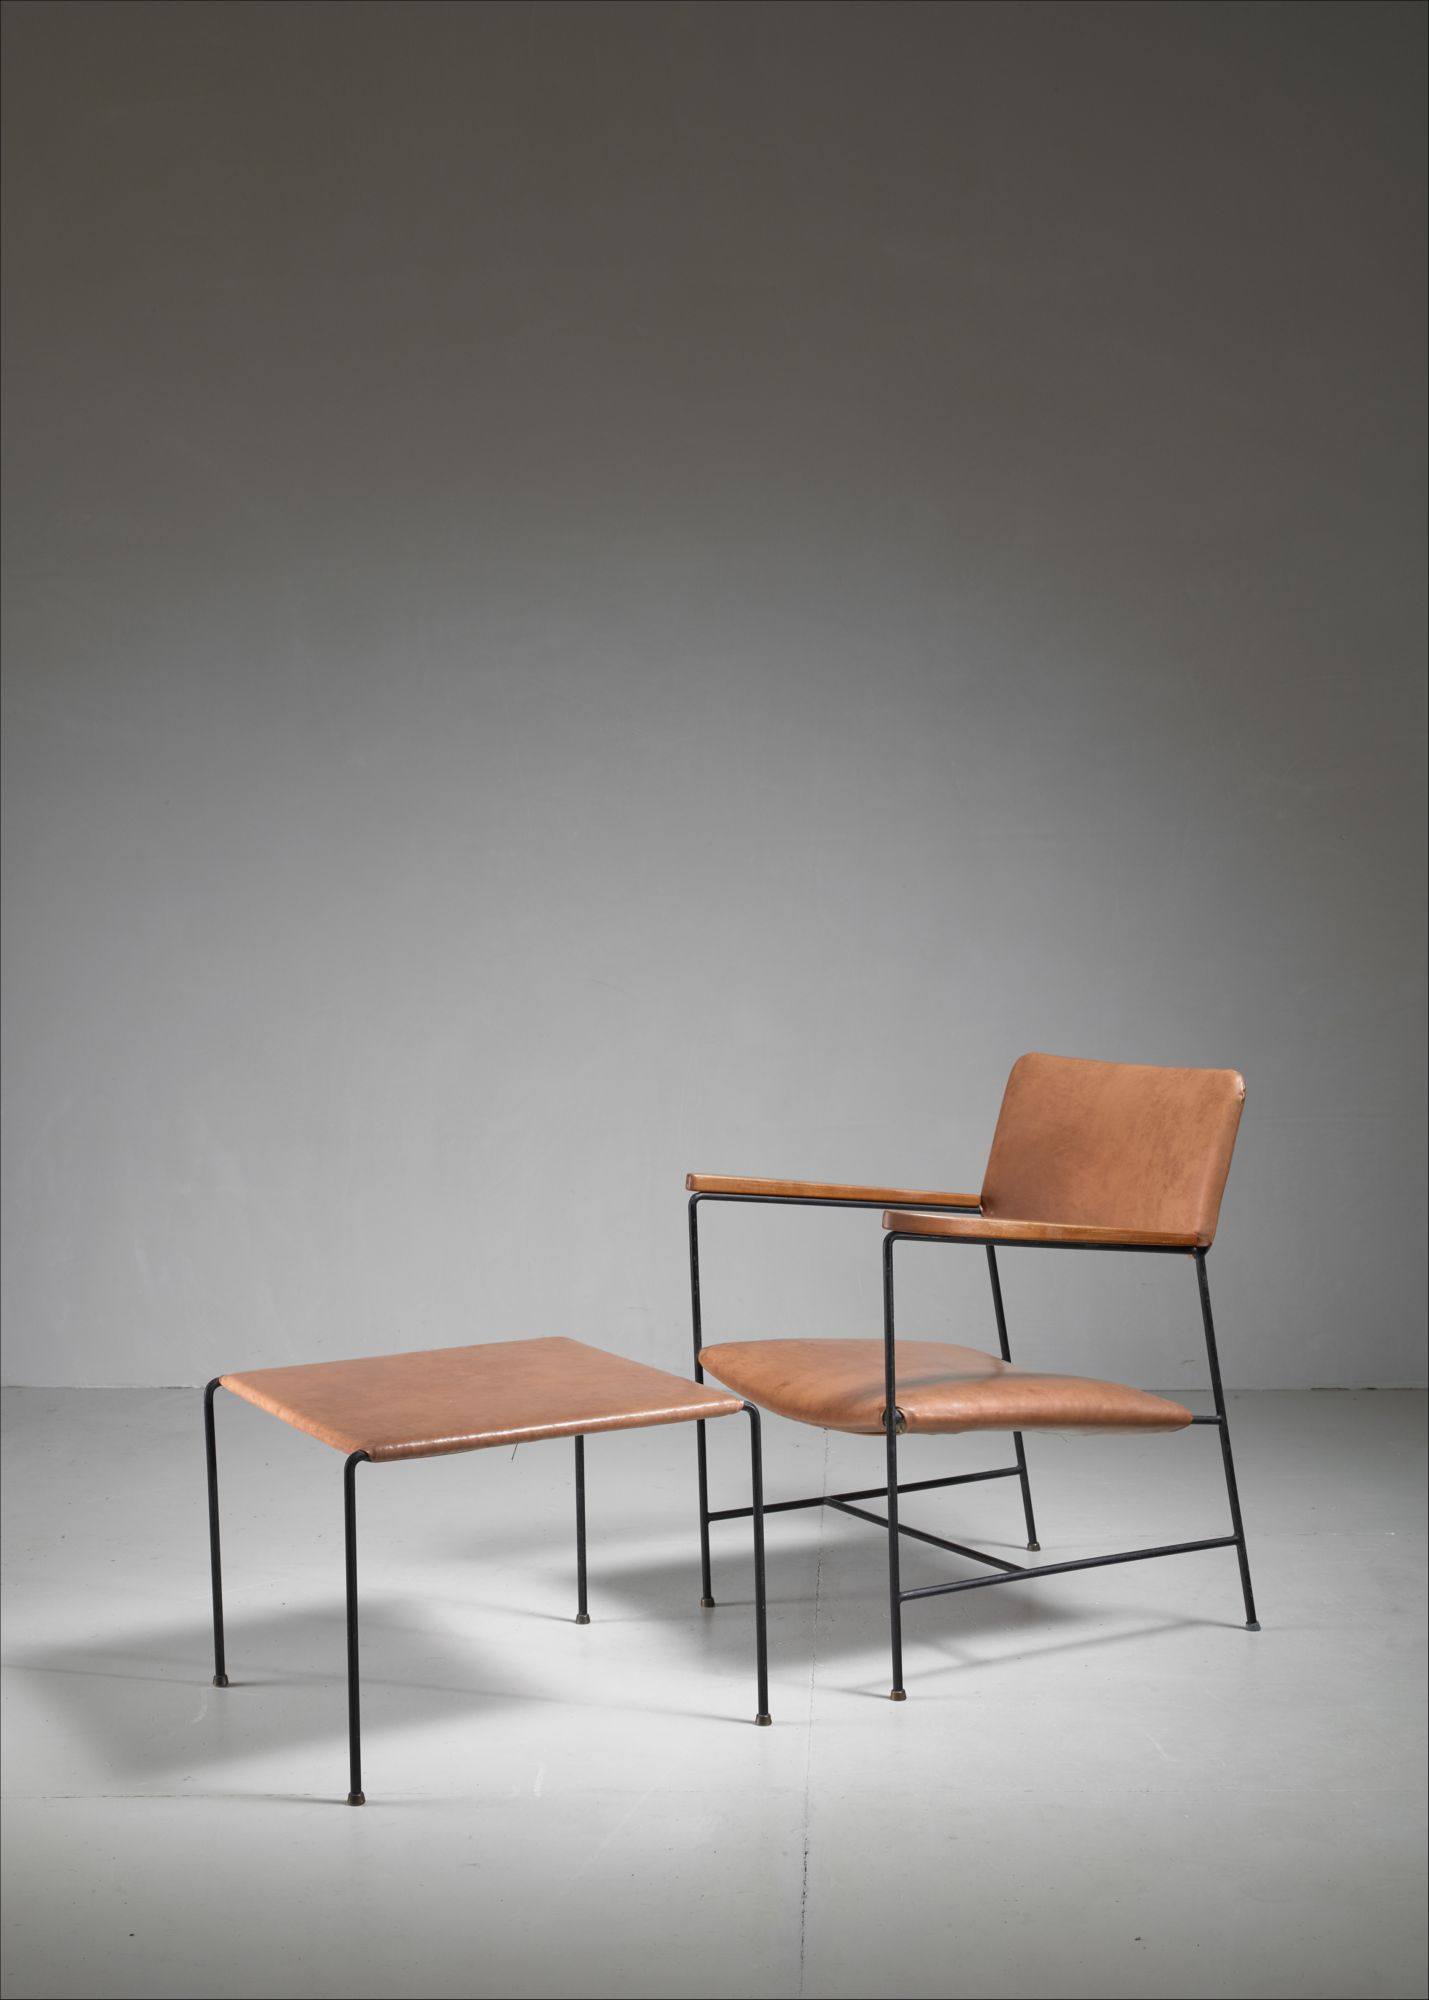 & Arden Riddle Iron and Naugahyde Chair with Ottoman USA 1960s